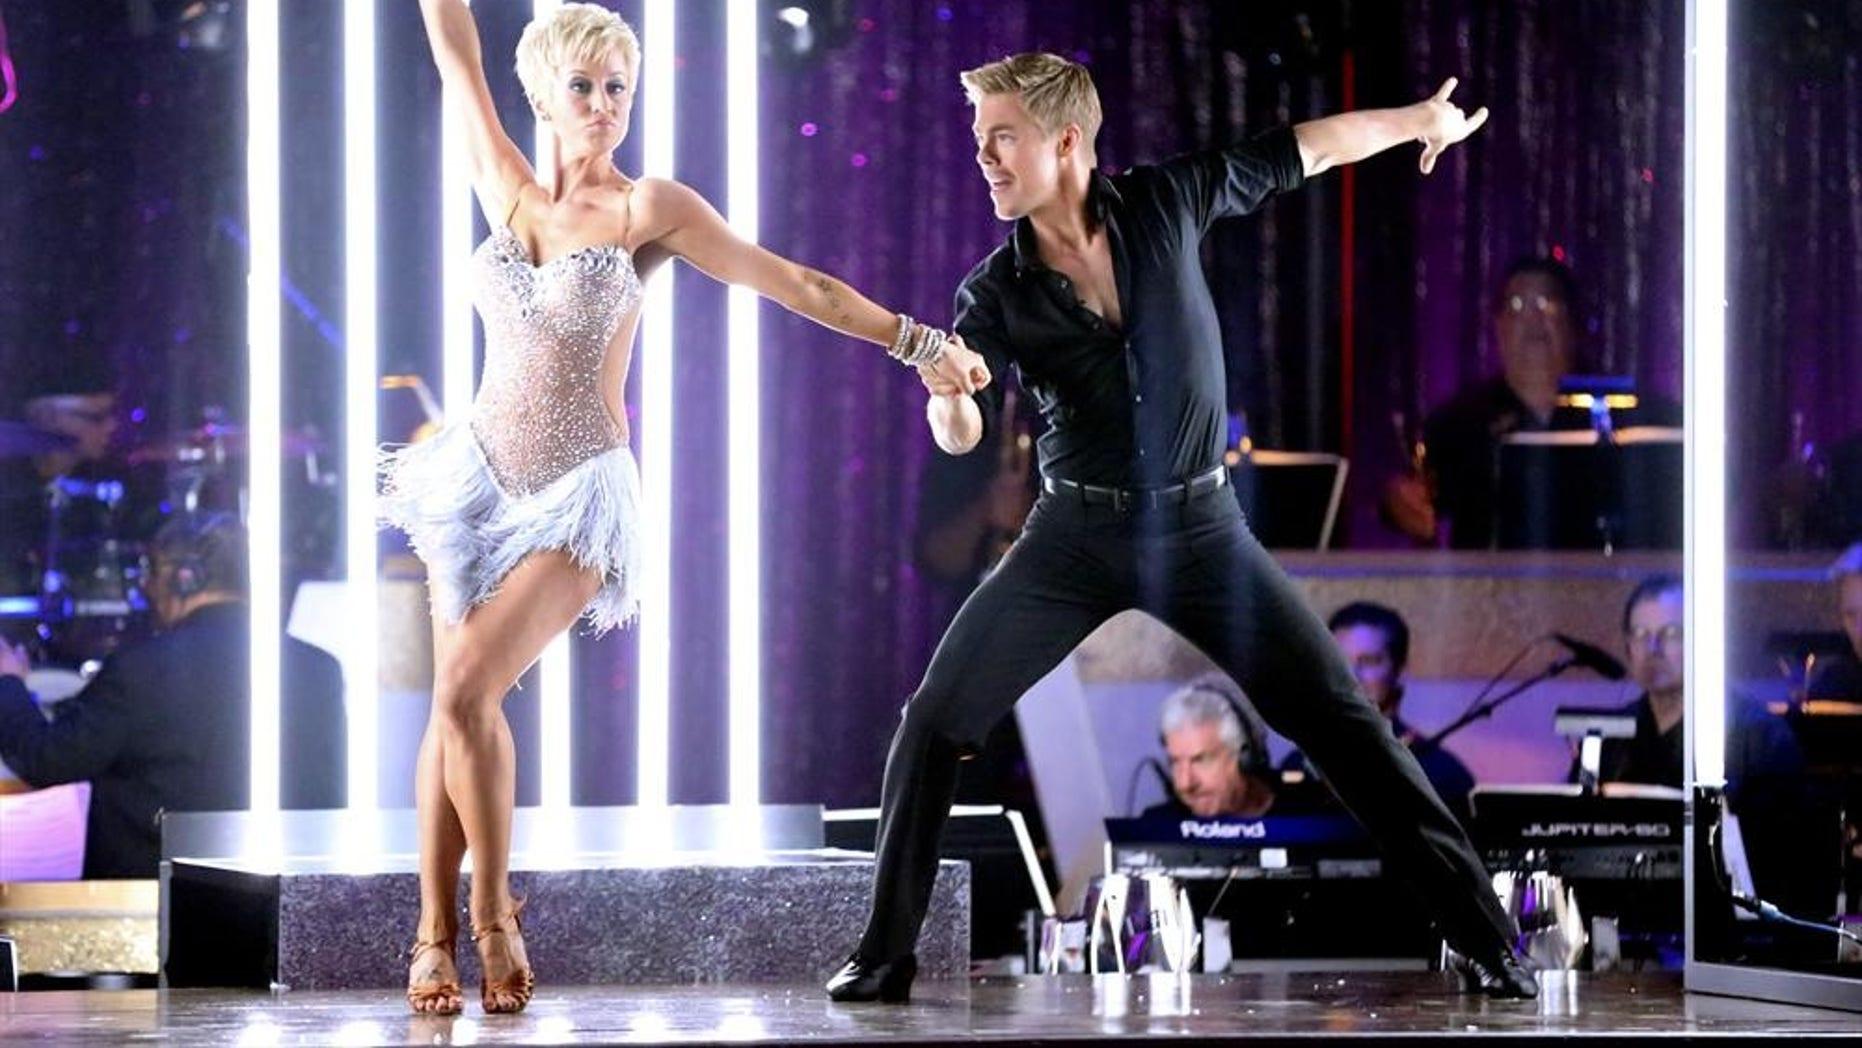 Singer Kellie Pickler and professional dancer Derek Hough competing on Dancing with the Stars.